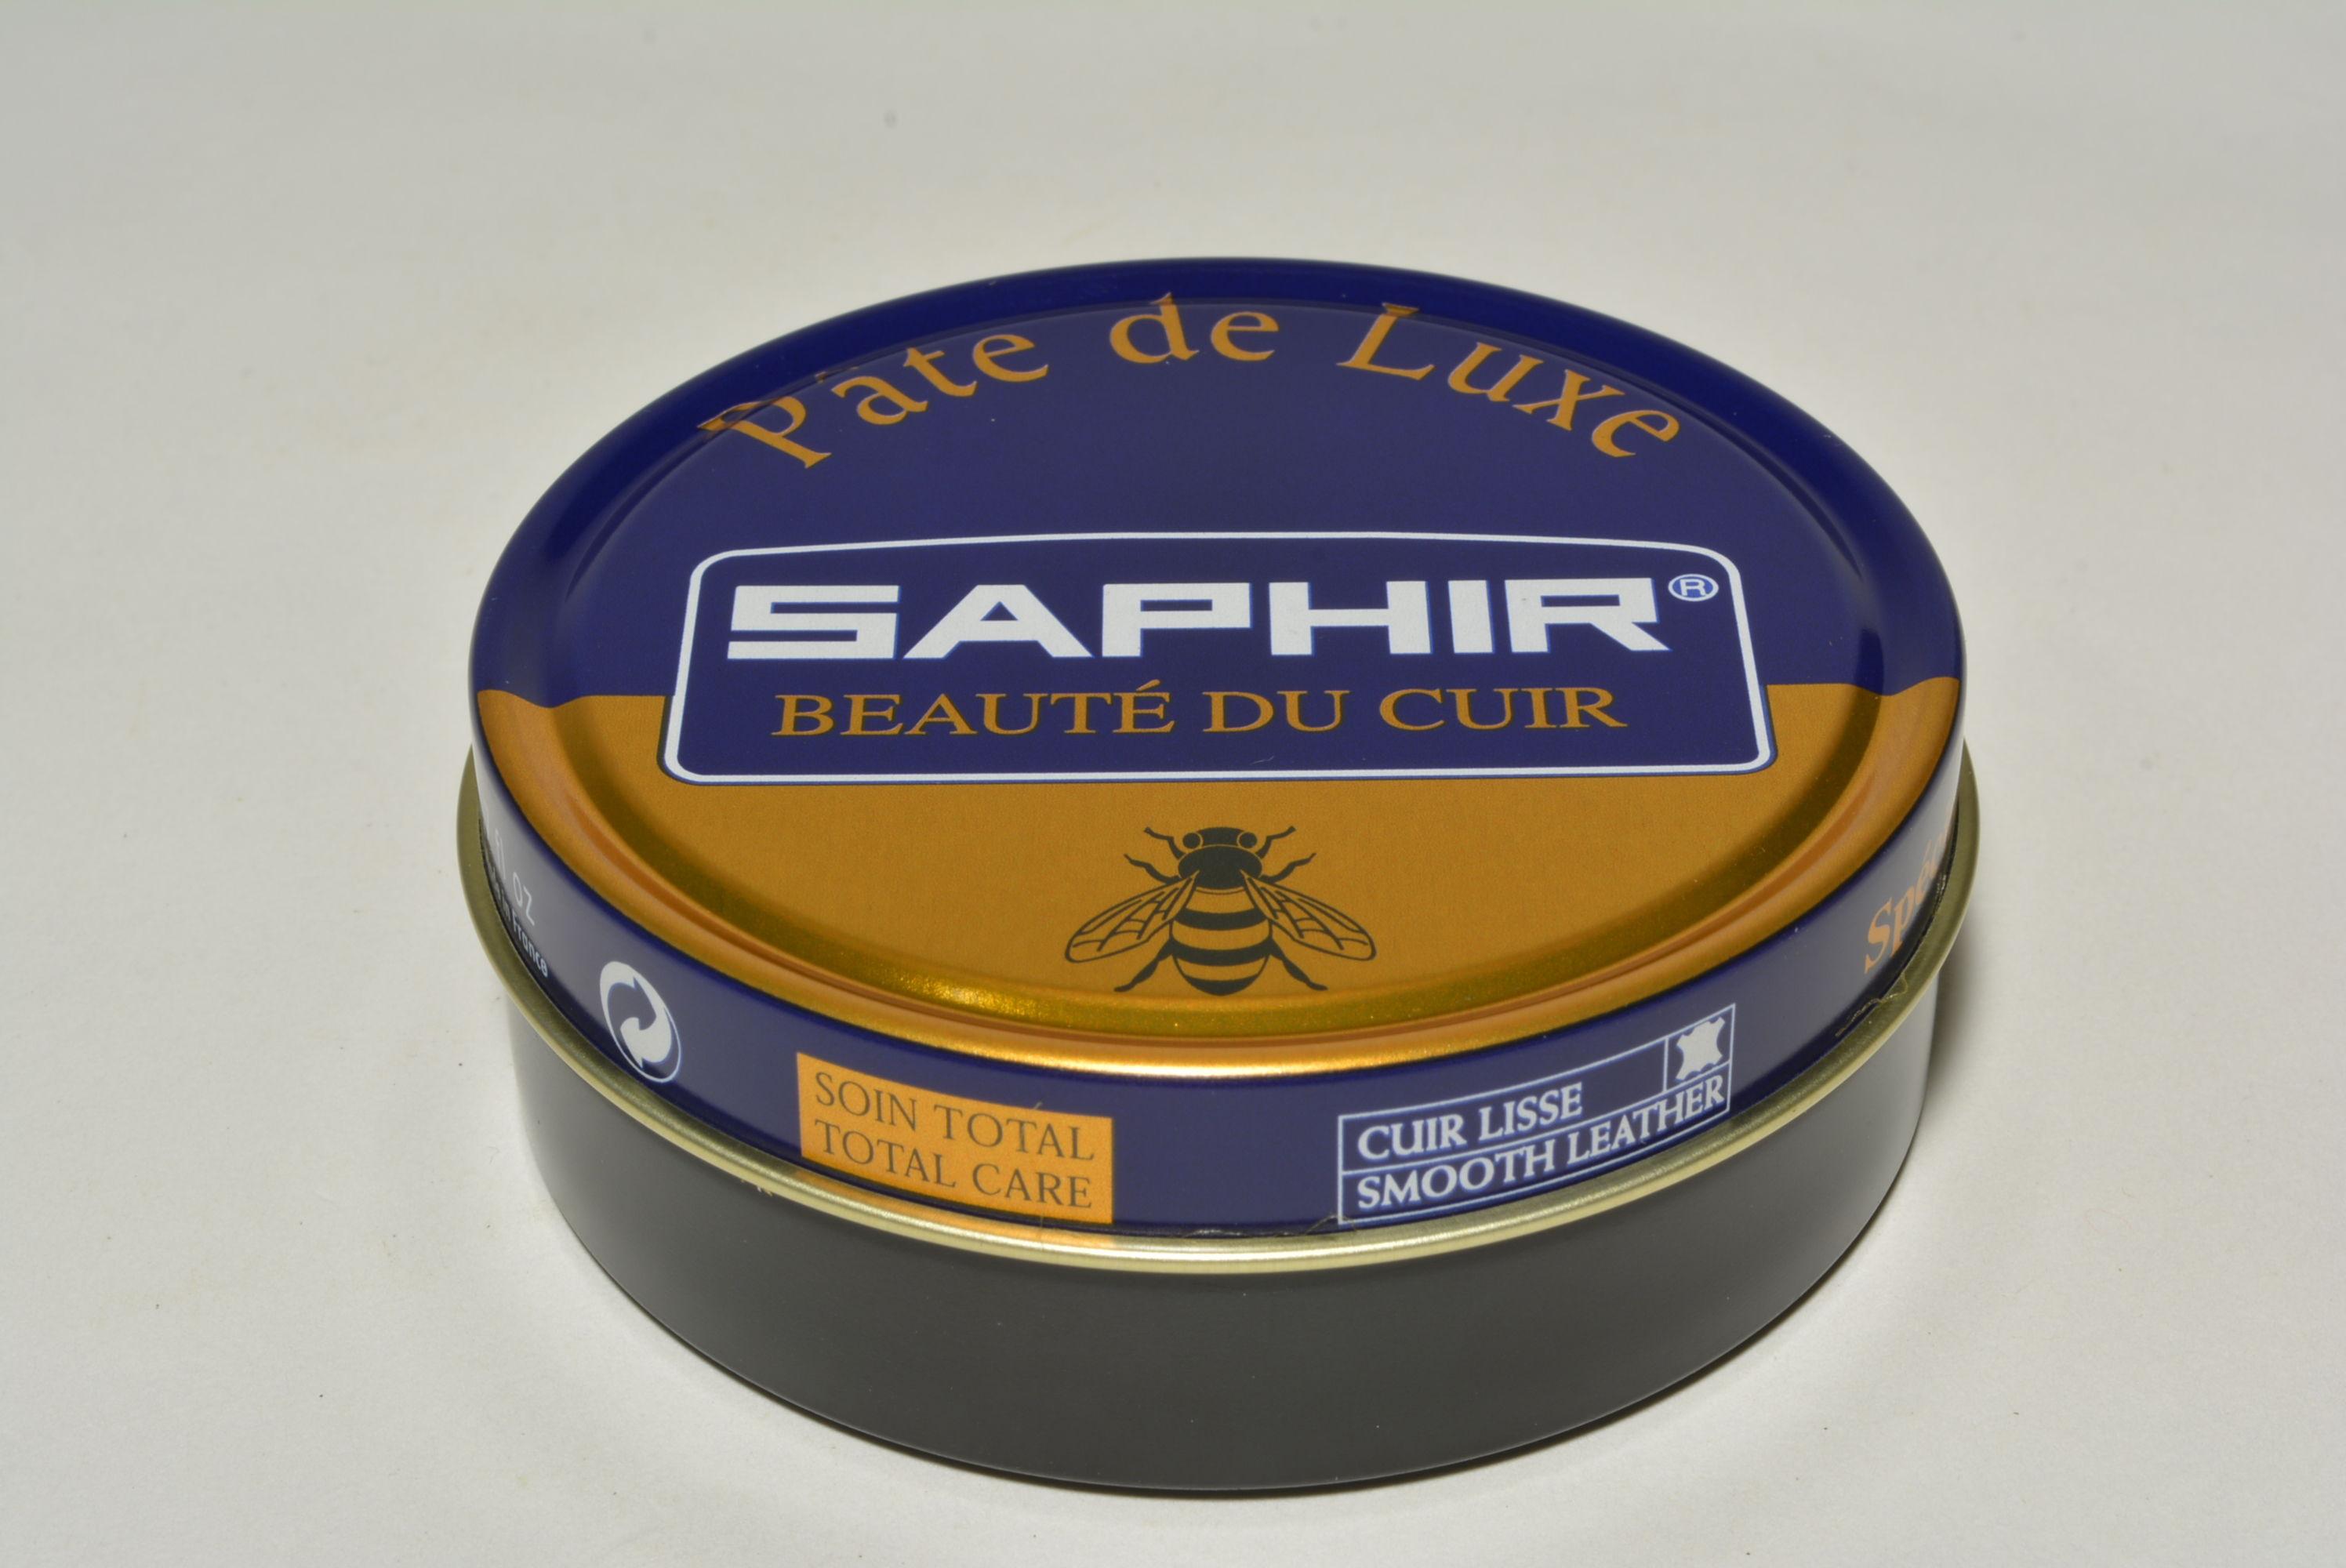 SAPHIR(サフィール) ビーズワックスポリッシュ(ツヤ出しワックス)